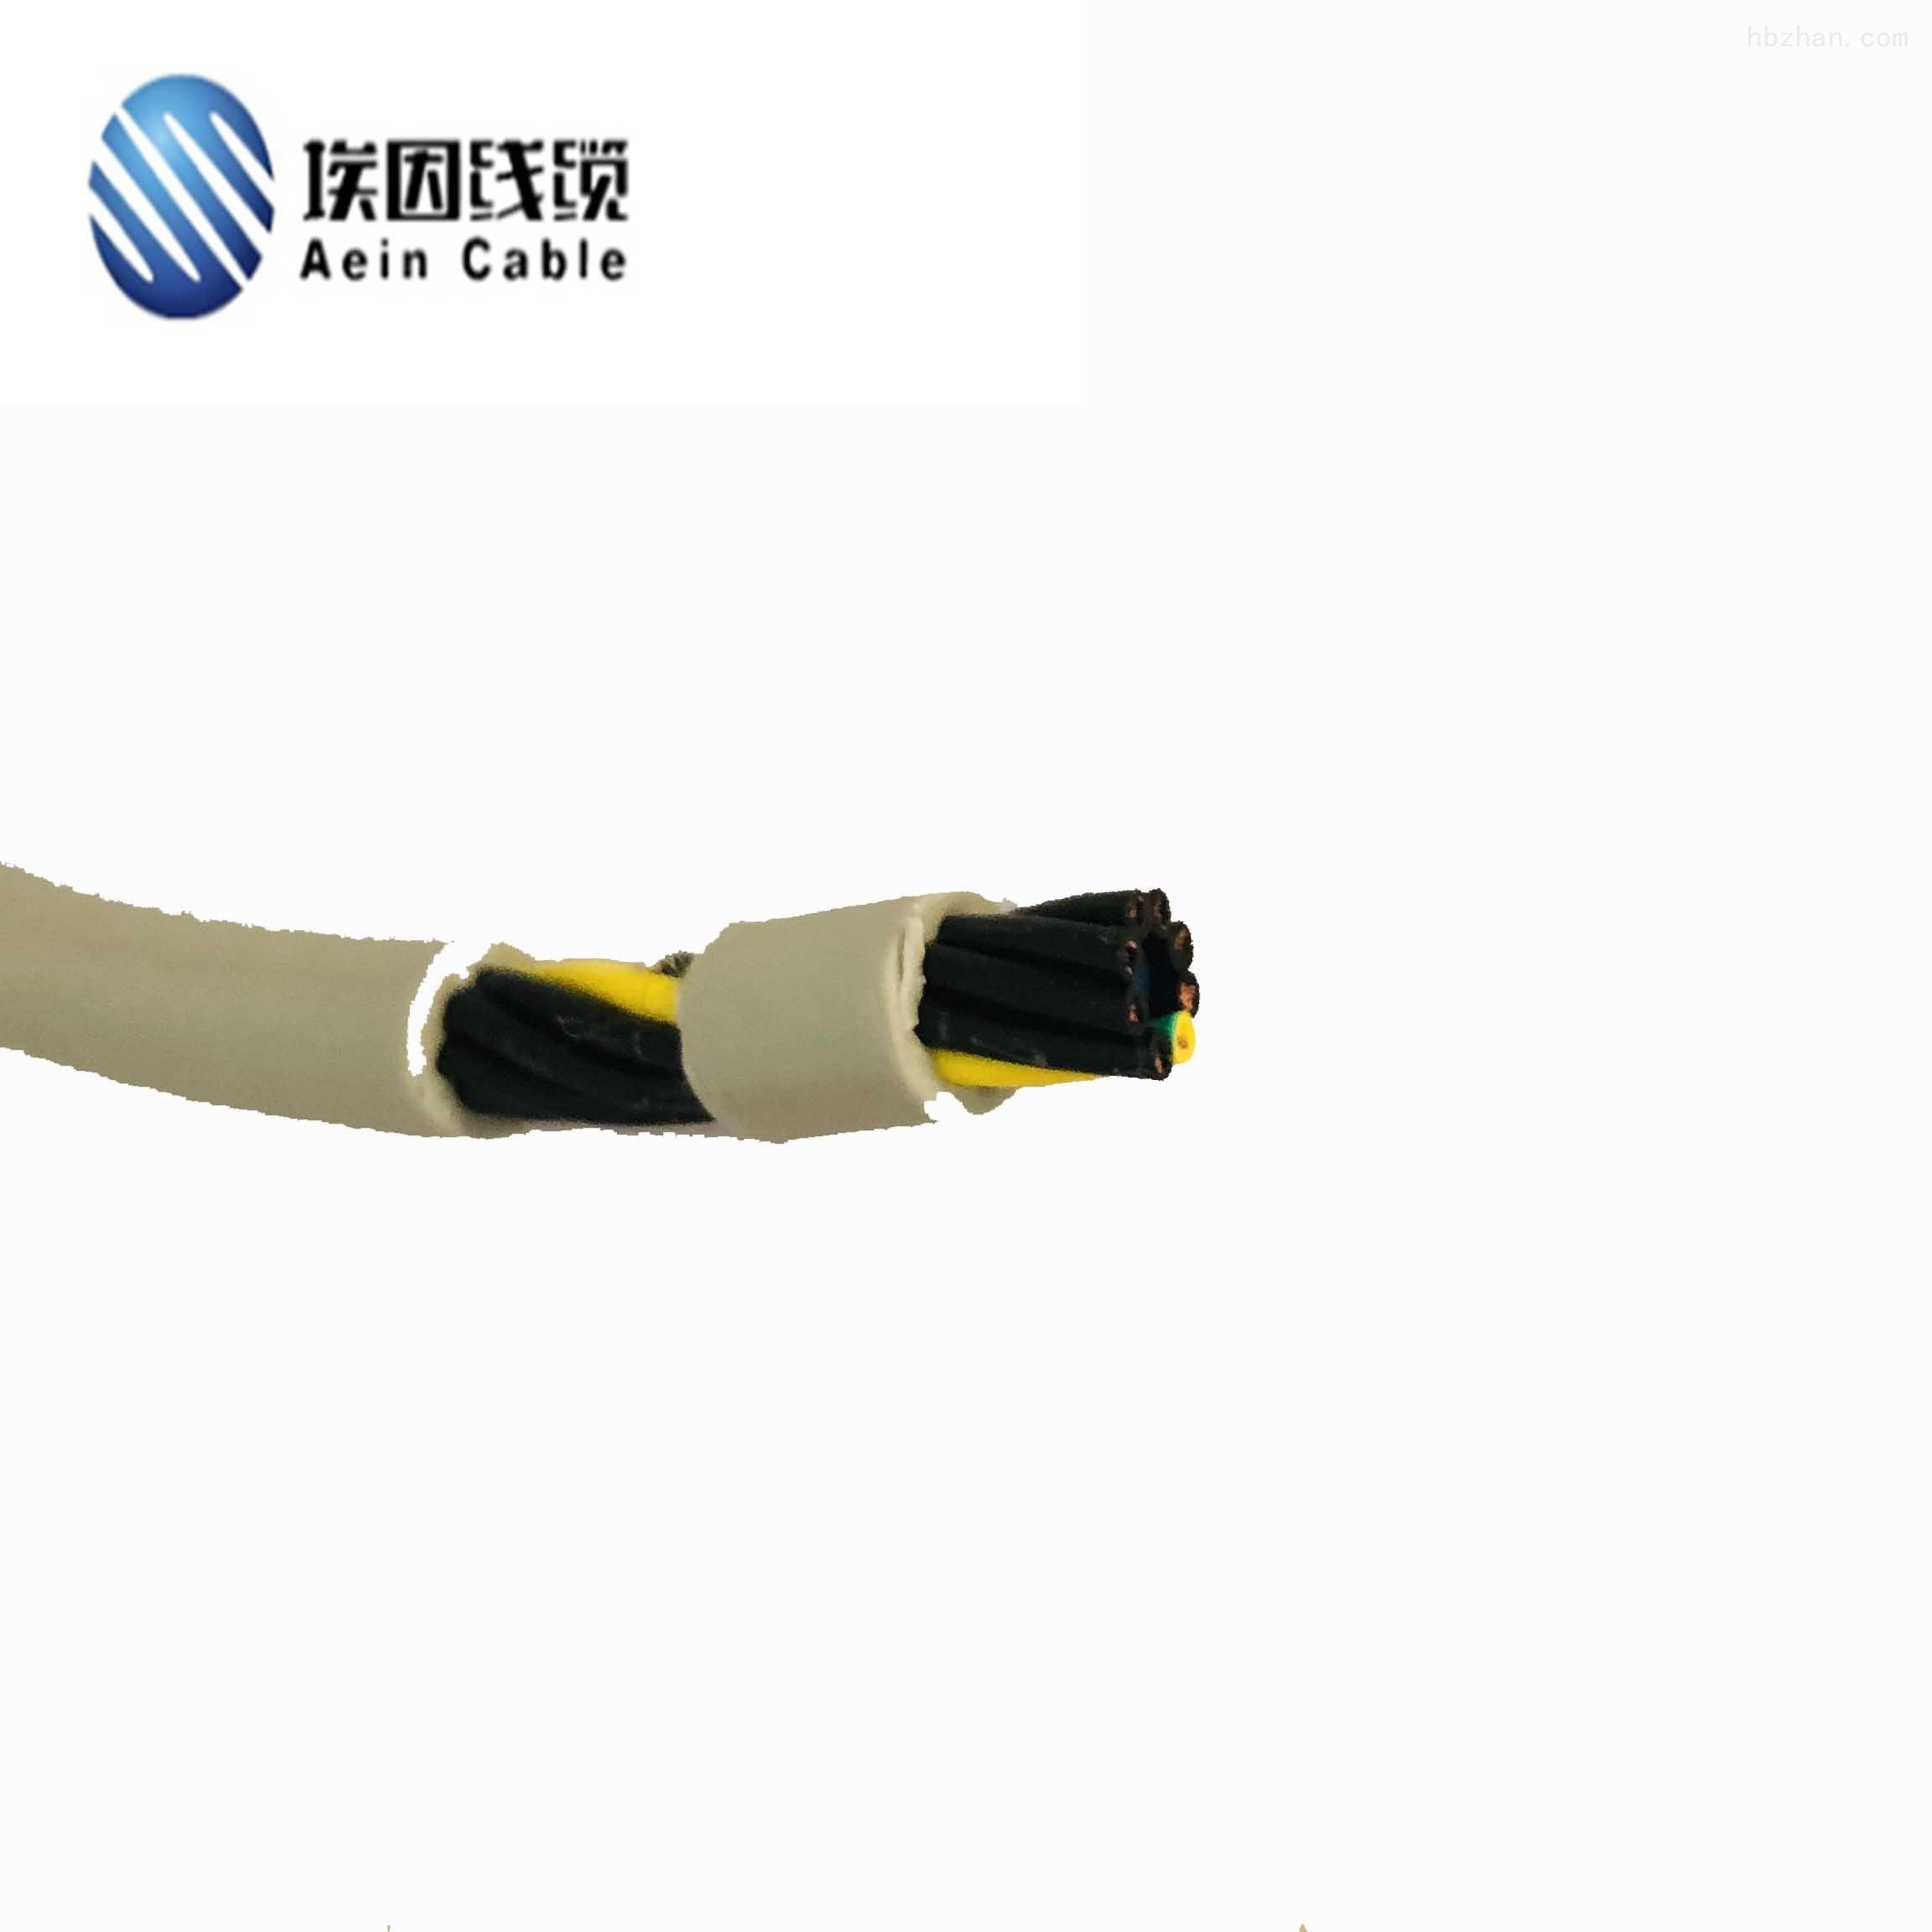 FESTOONFLEX PUR-HF 中低压聚氨酯电缆